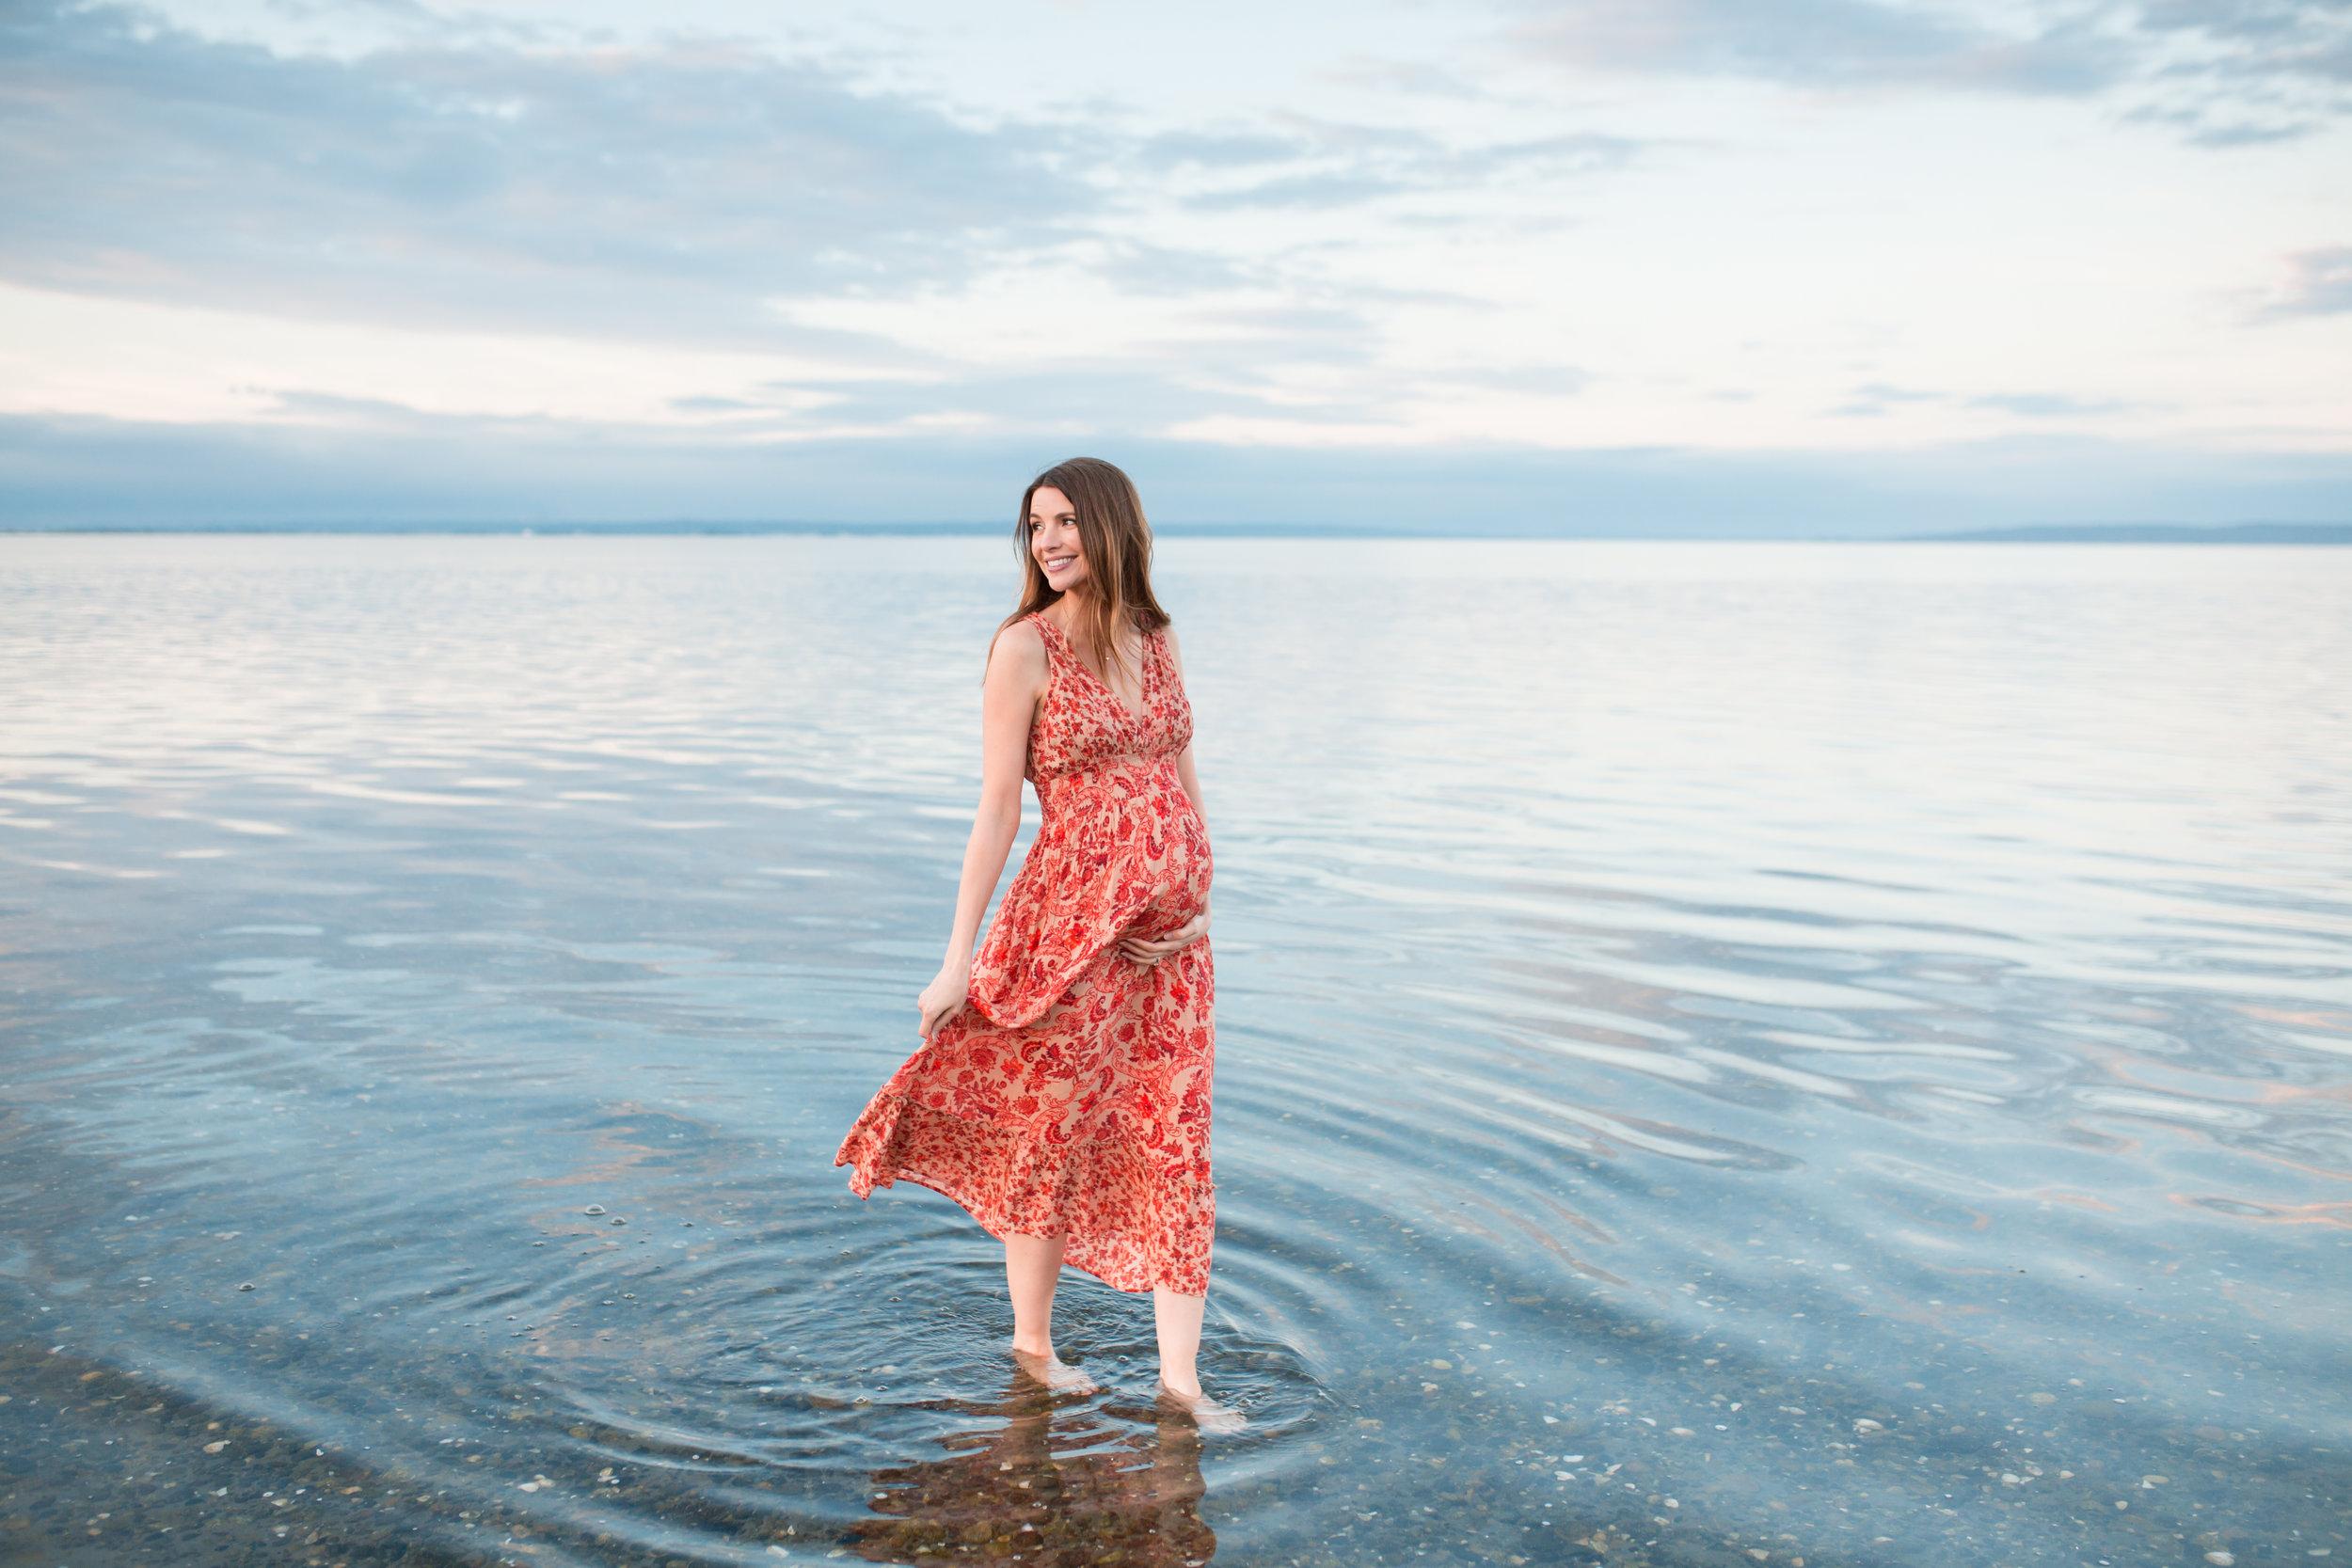 Centennial Beach Maternity Photos -9.jpg